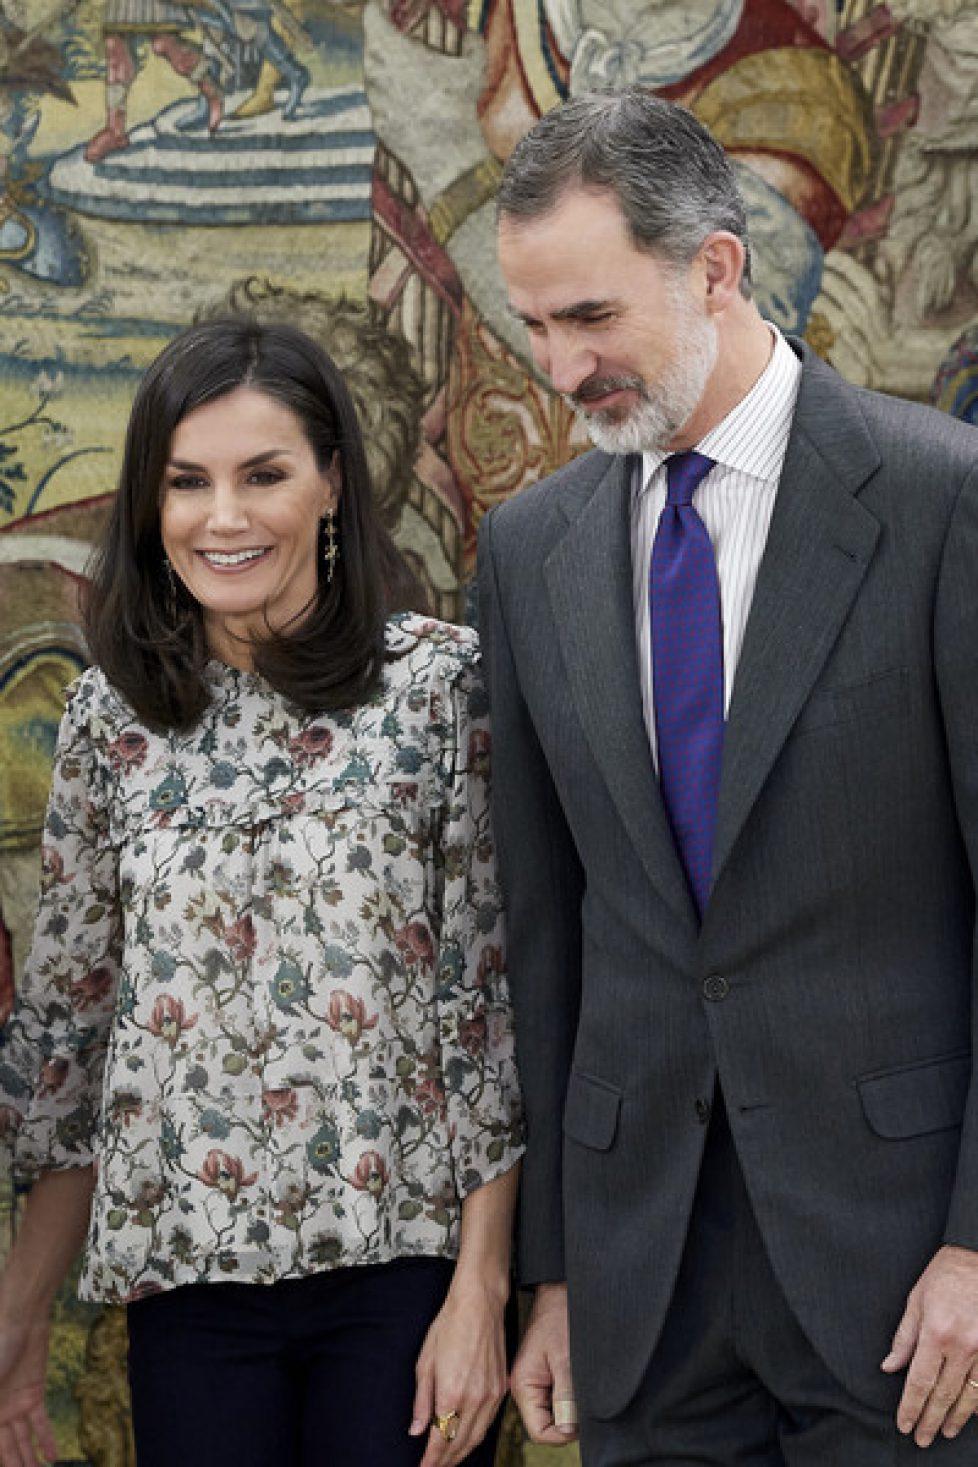 Queen+Letizia+Spain+Spanish+Royals+Attend+riqQrSMf_XAl